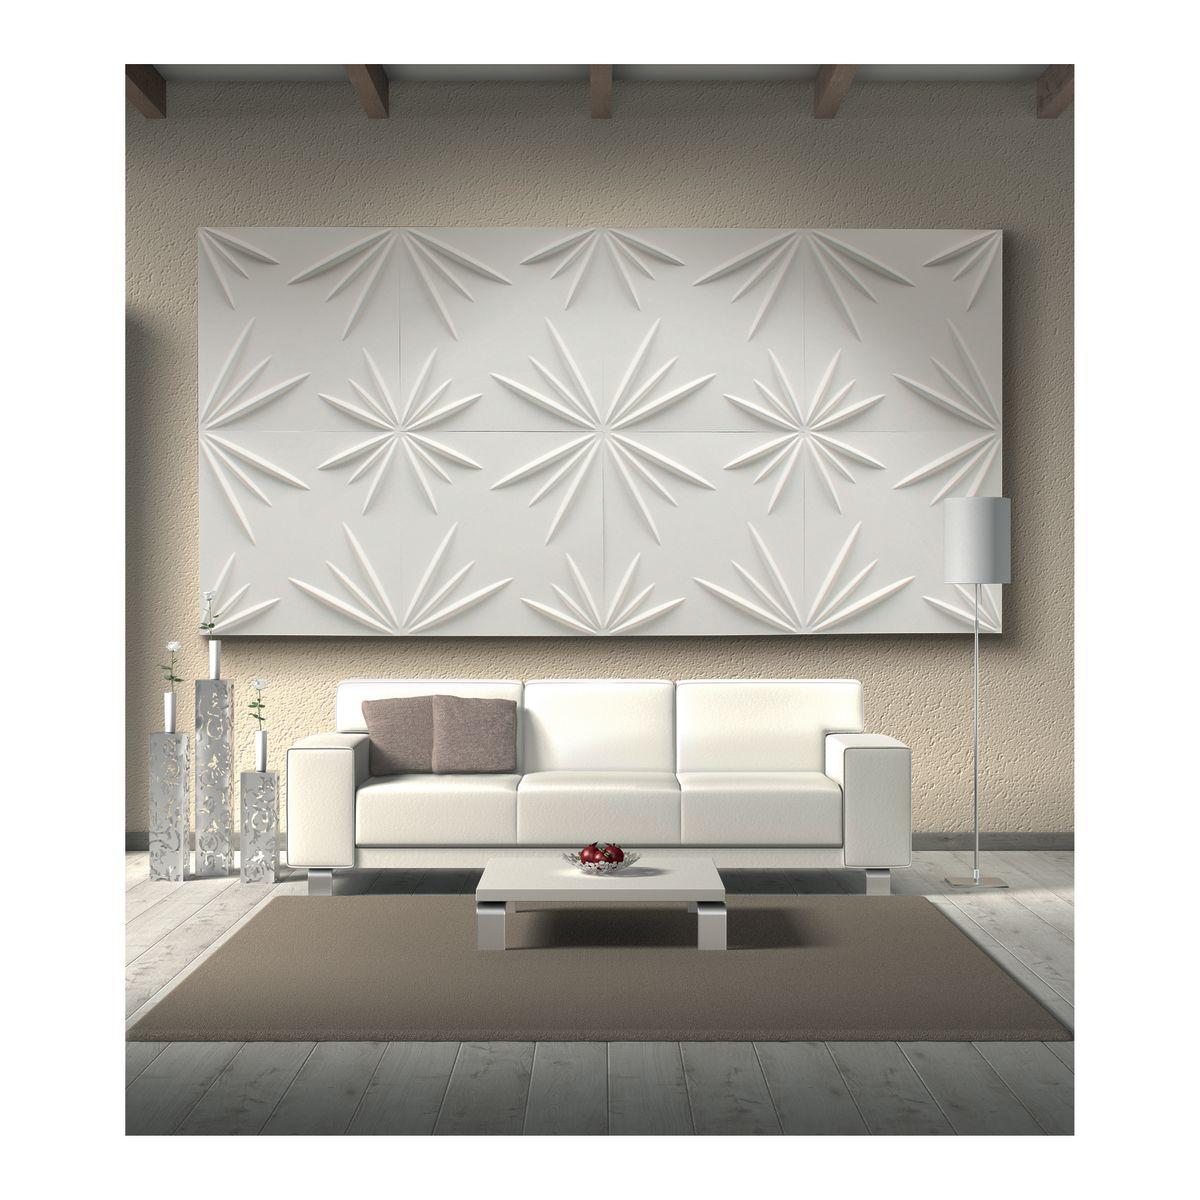 Rivestimento decorativo leroy merlin hc61 regardsdefemmes - Pannelli decorativi per porte ...